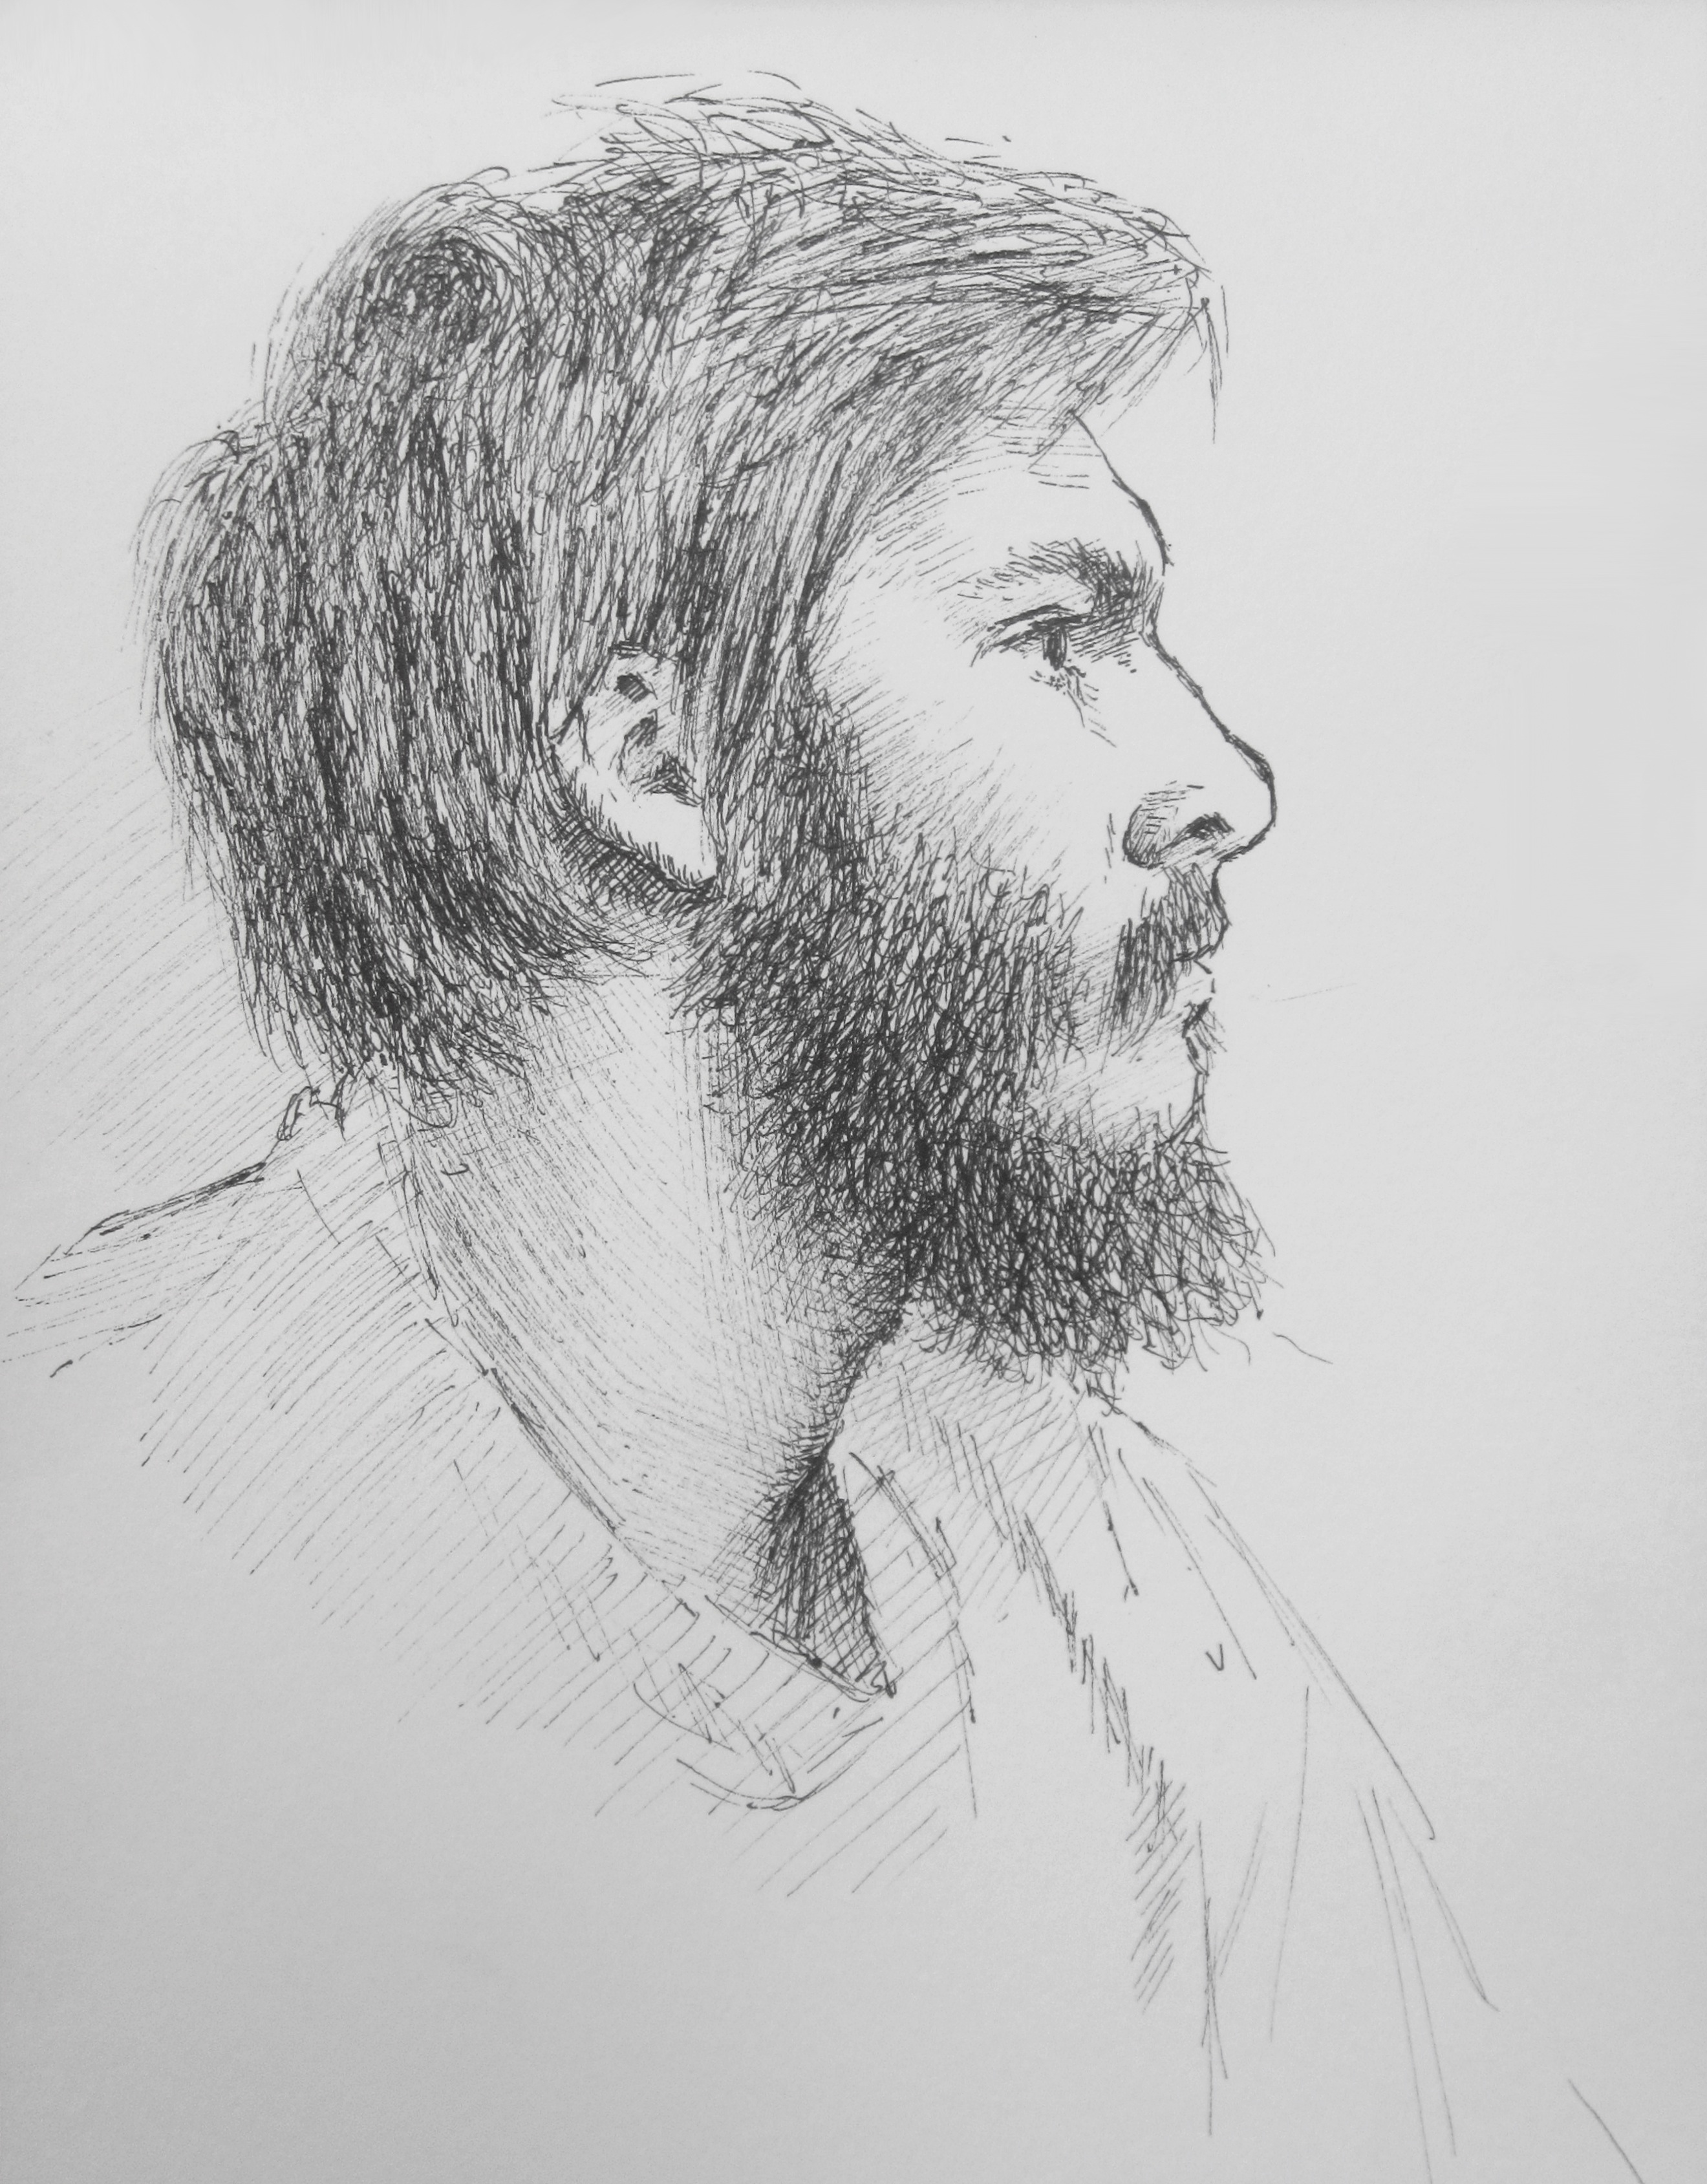 Eirik, Central Park Sitting Sketch